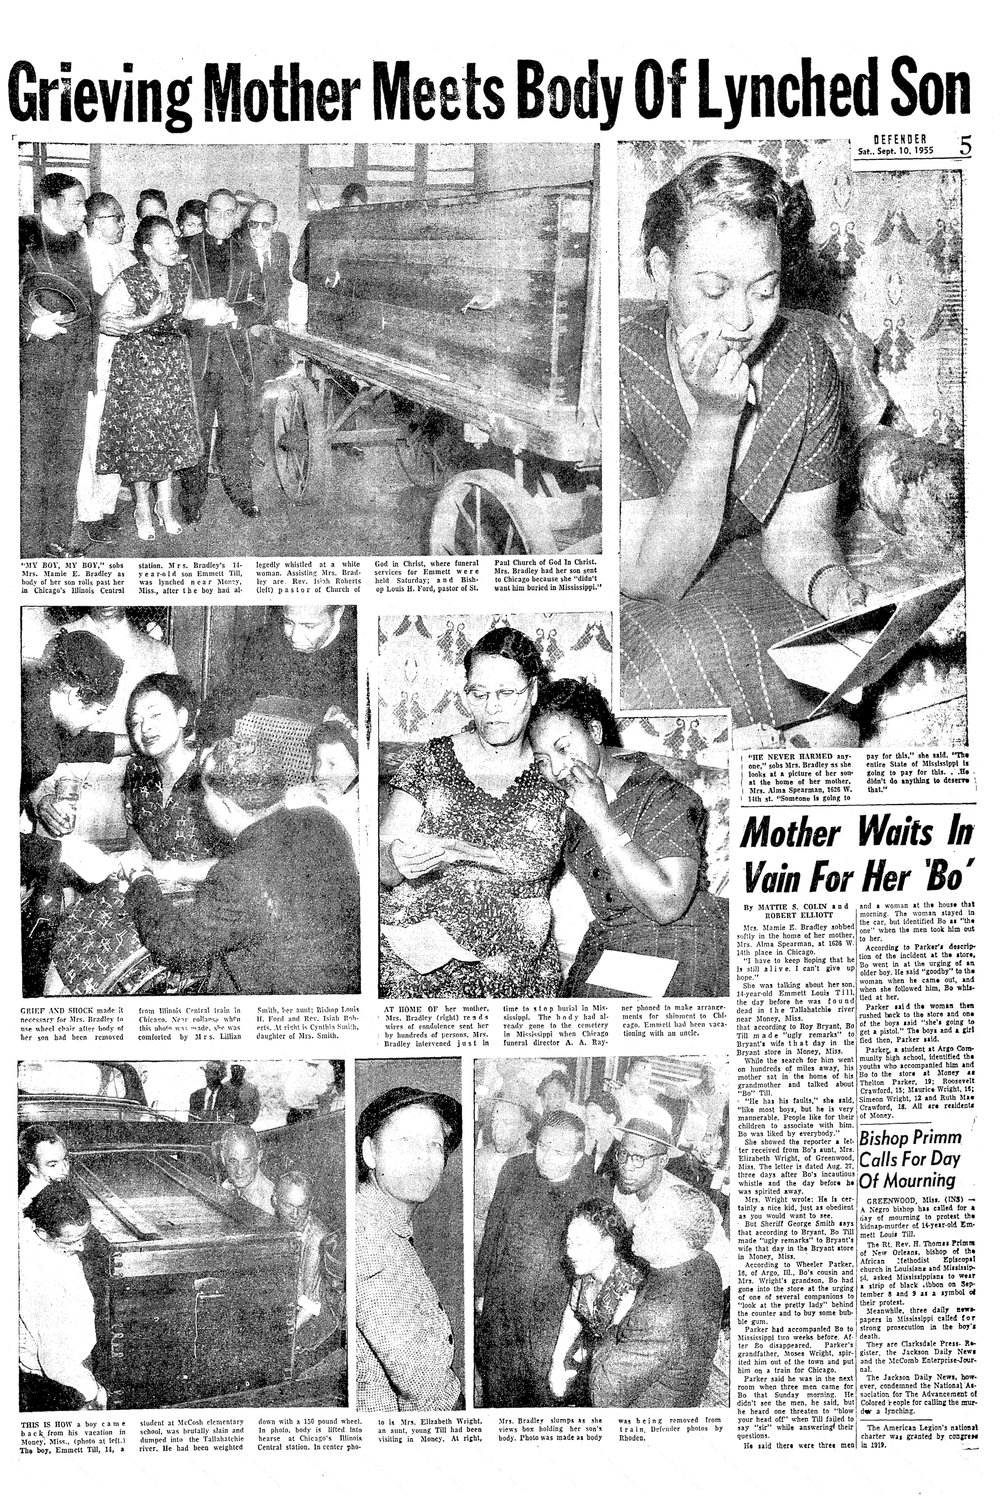 9.10.1955